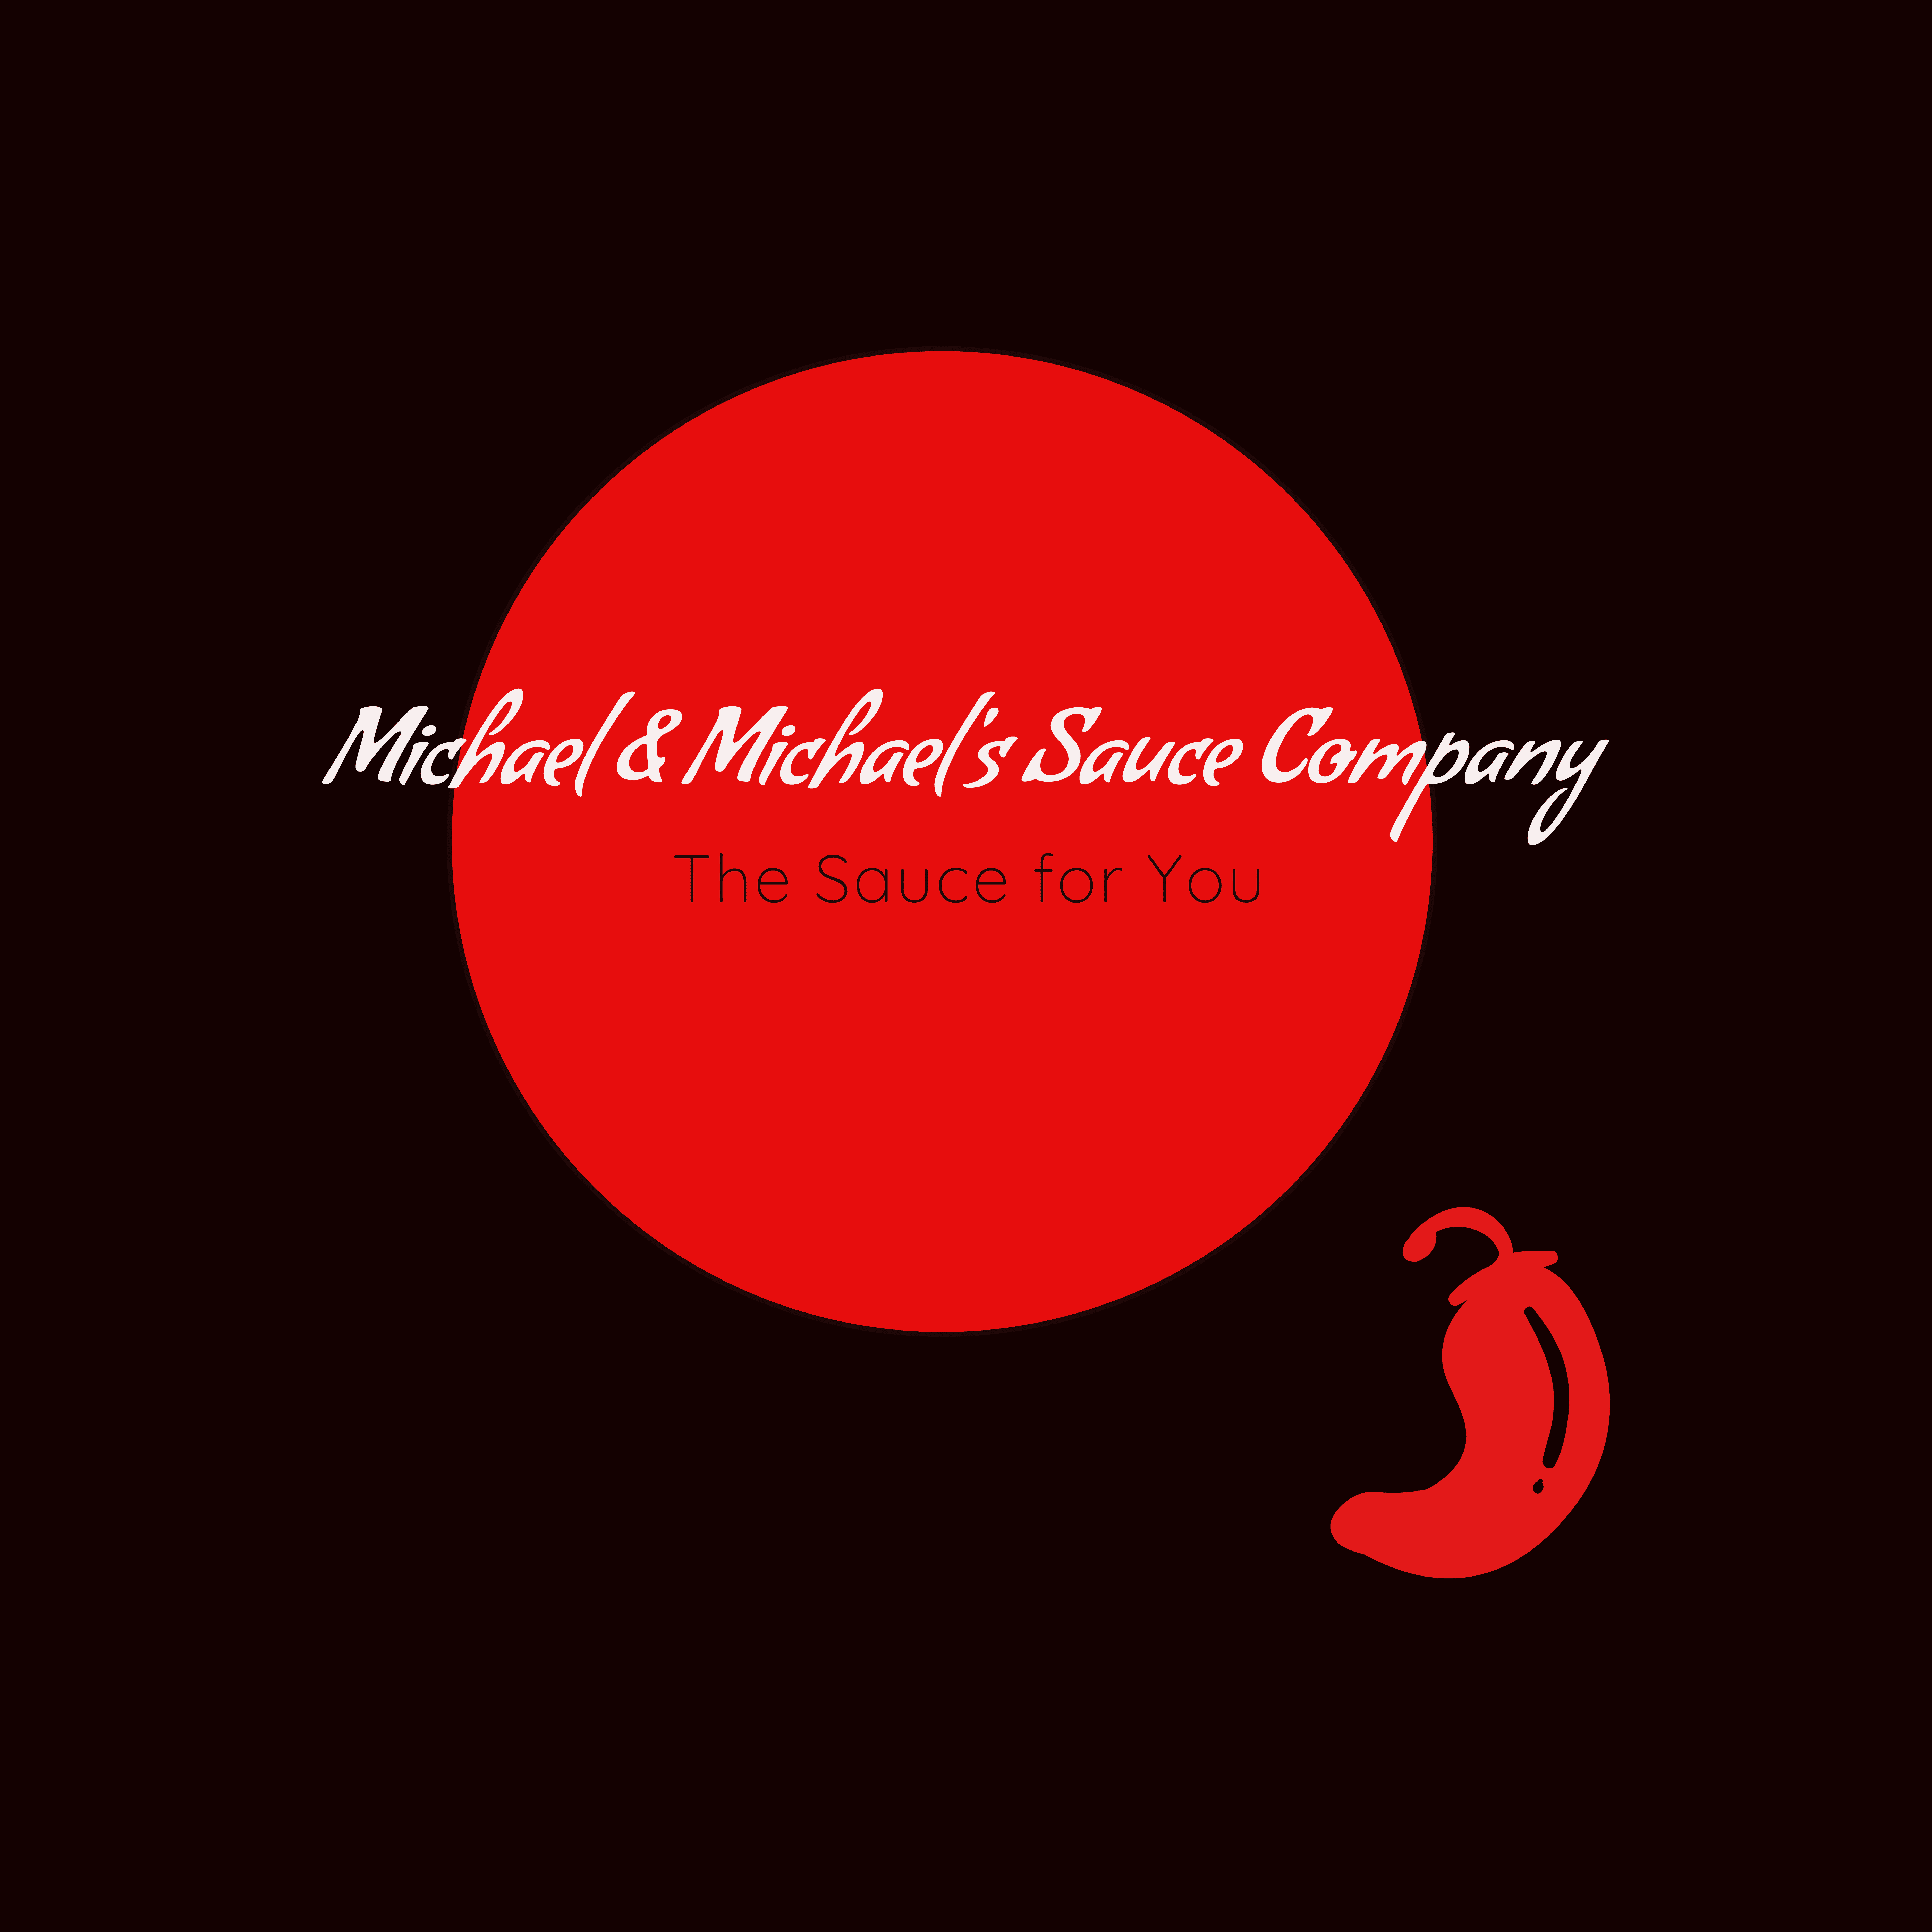 Michael & Michael's Sauce Company